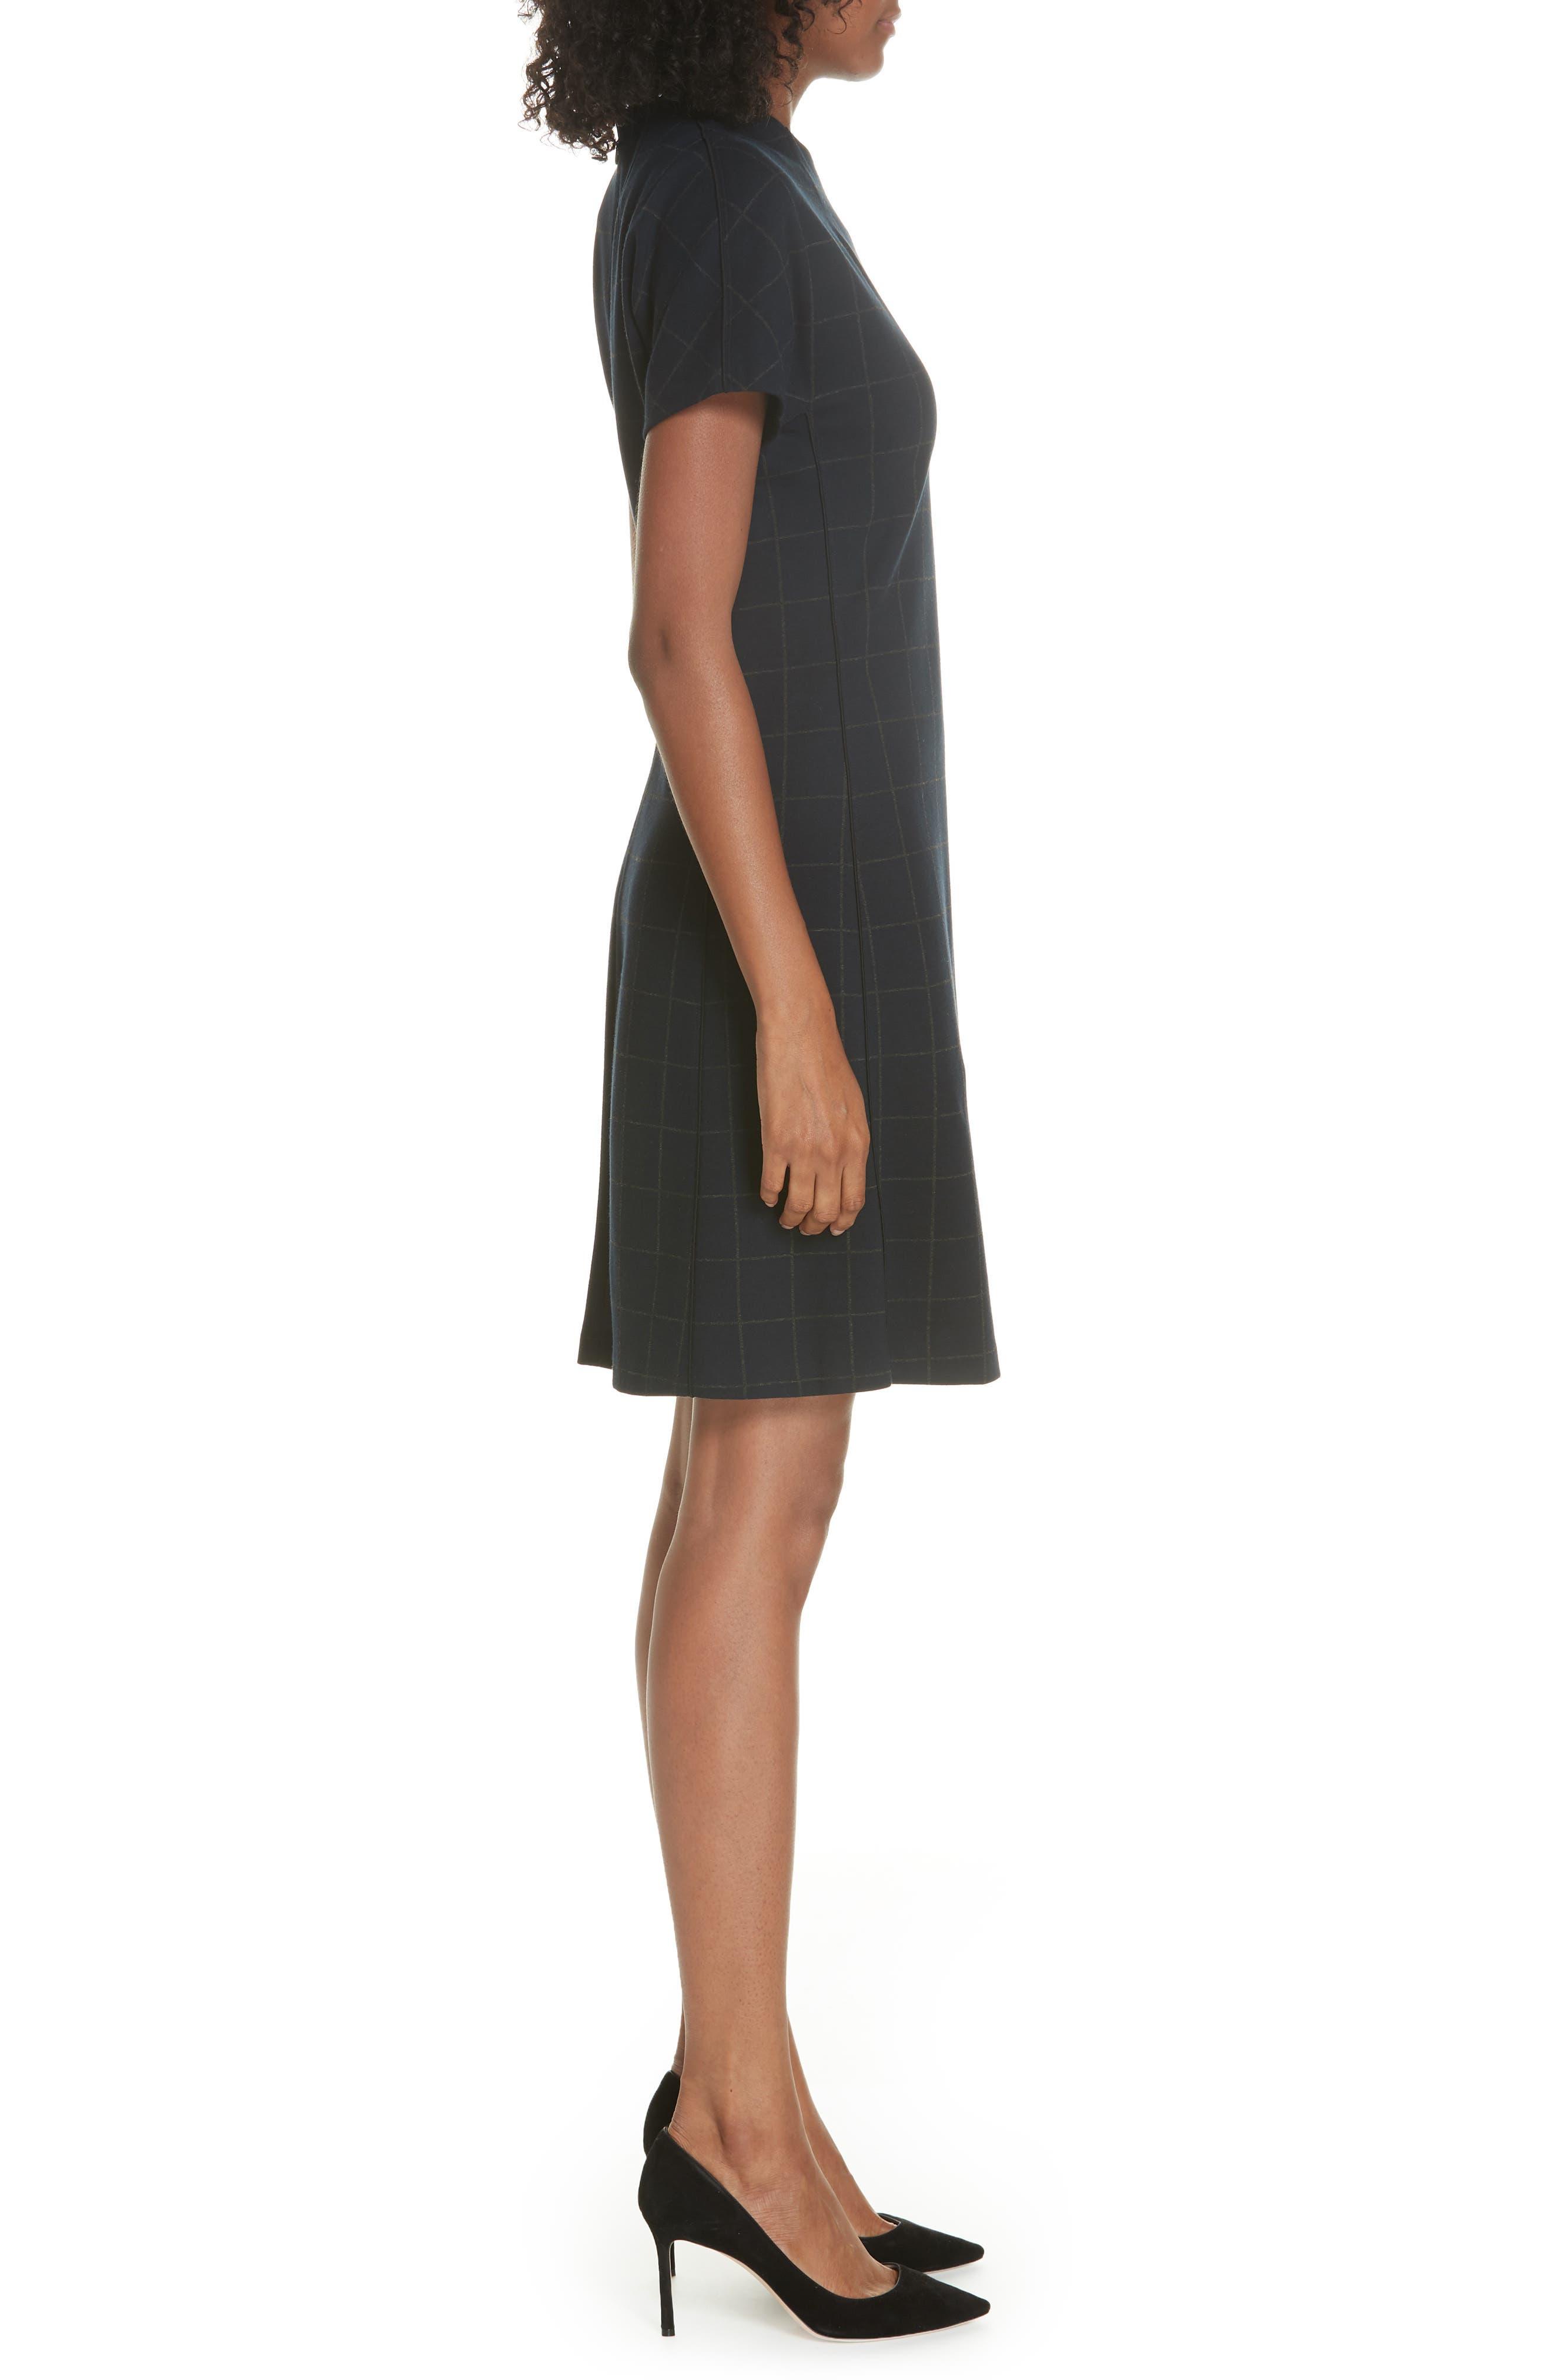 Windowpane Knit A-Line Dress,                             Alternate thumbnail 3, color,                             DEEP NAVY/ CHARCOAL MELANGE